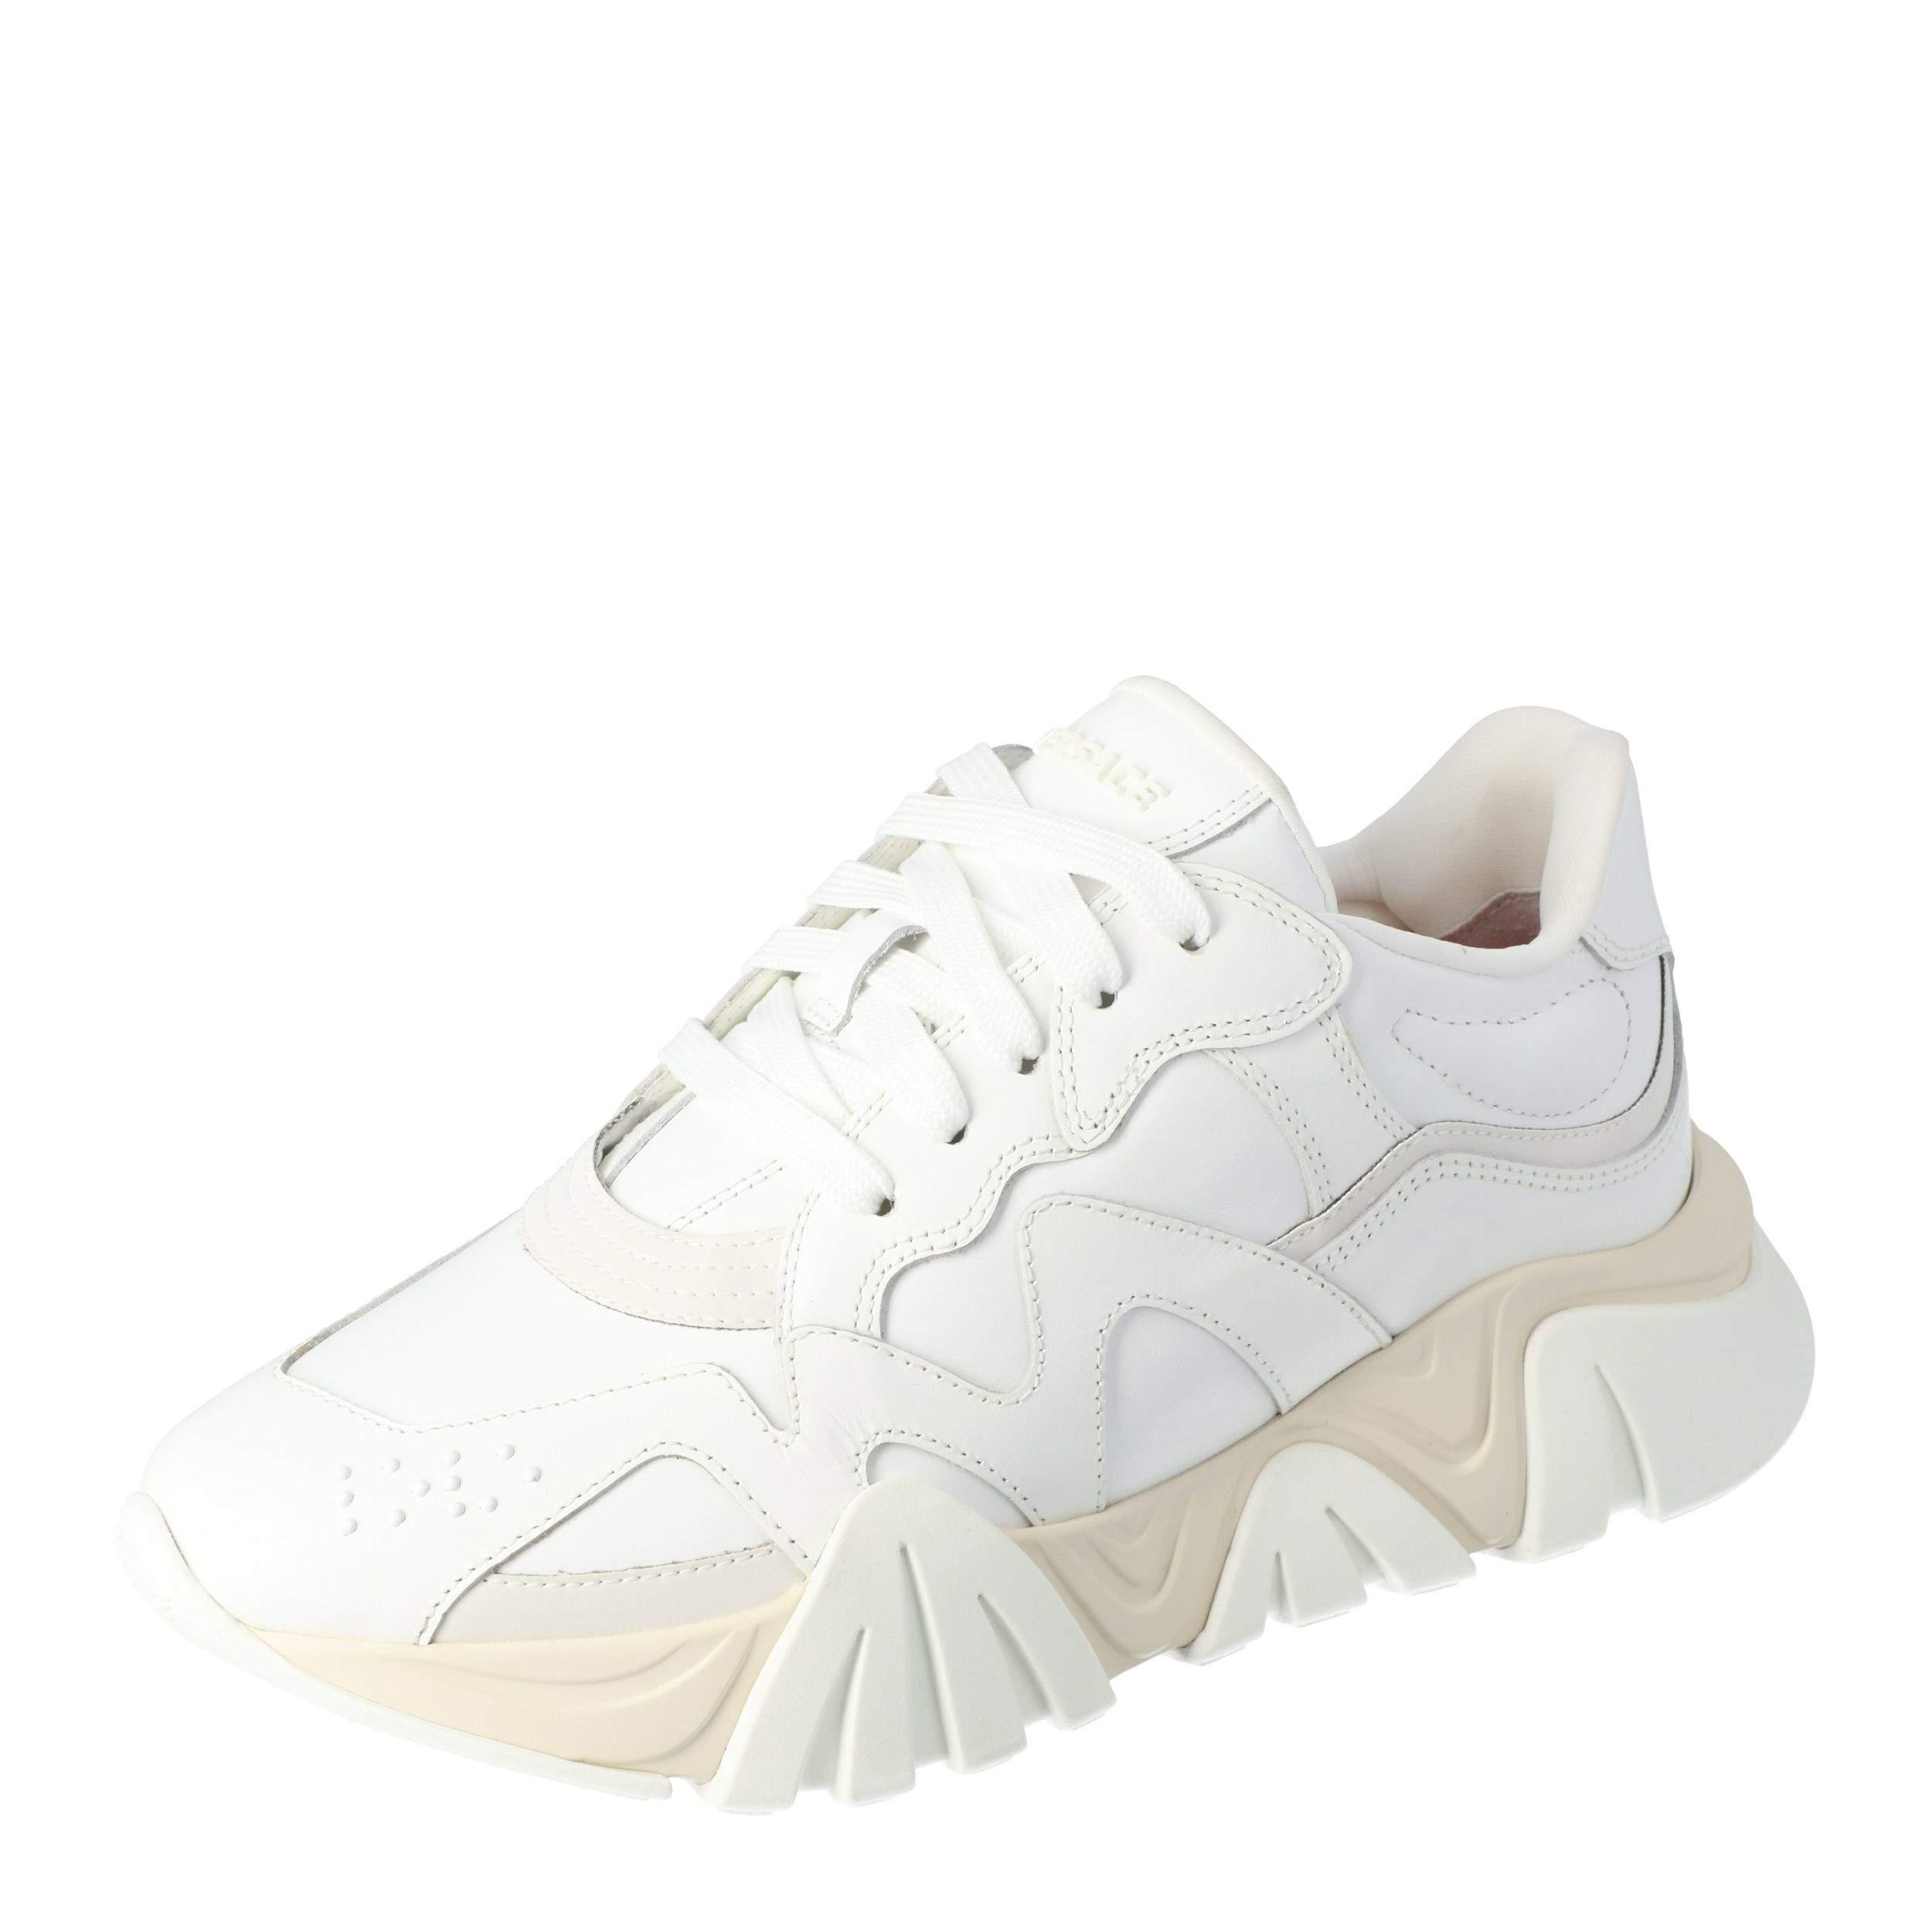 Versace White Leather Squalo Platform